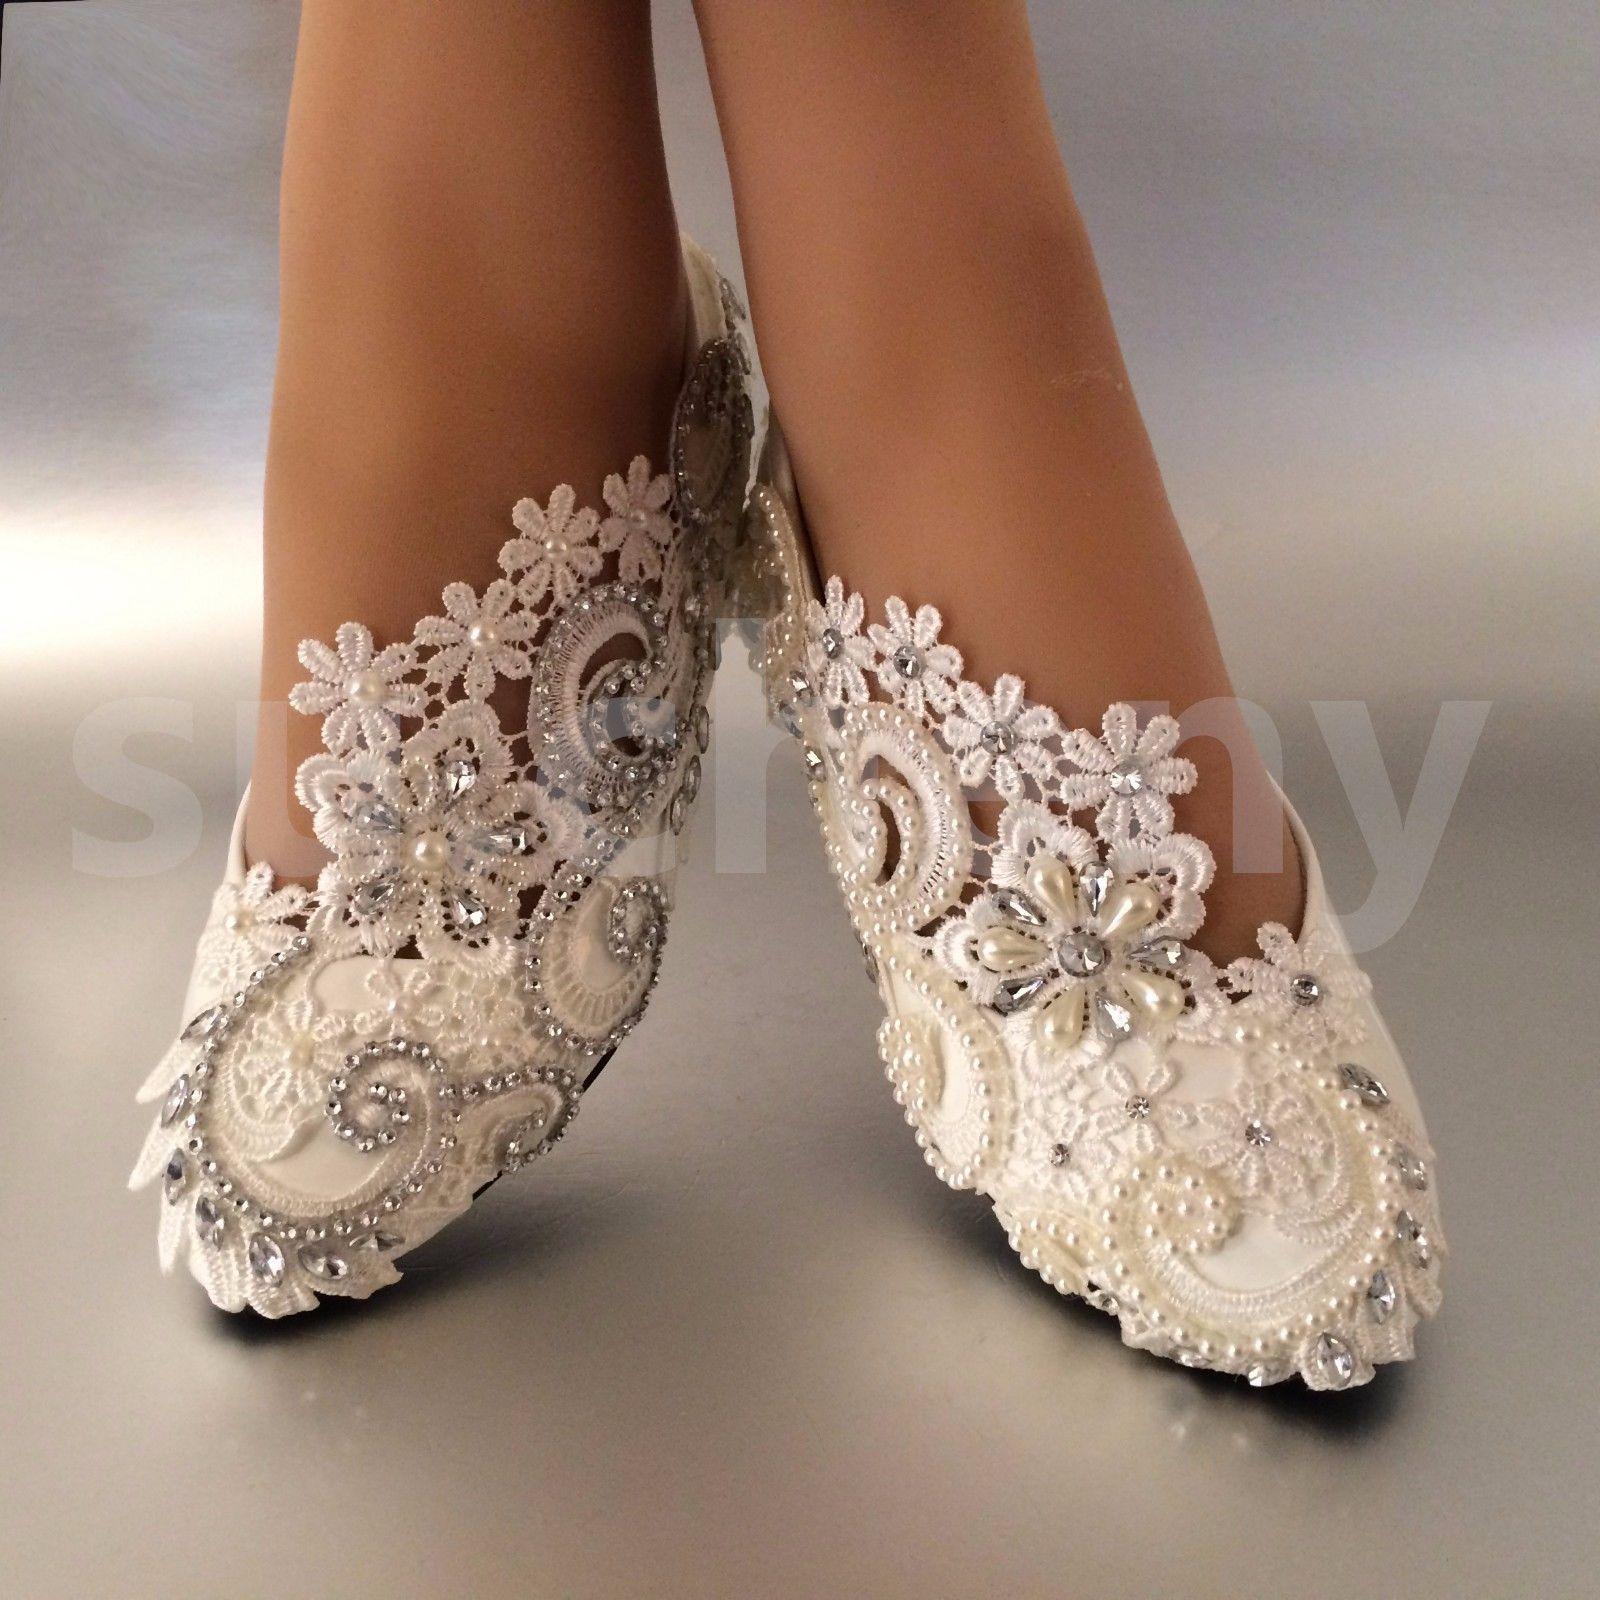 14e8f734923 su.cheny White ivory pearls rhinestones lace flat Wedding shoes ...